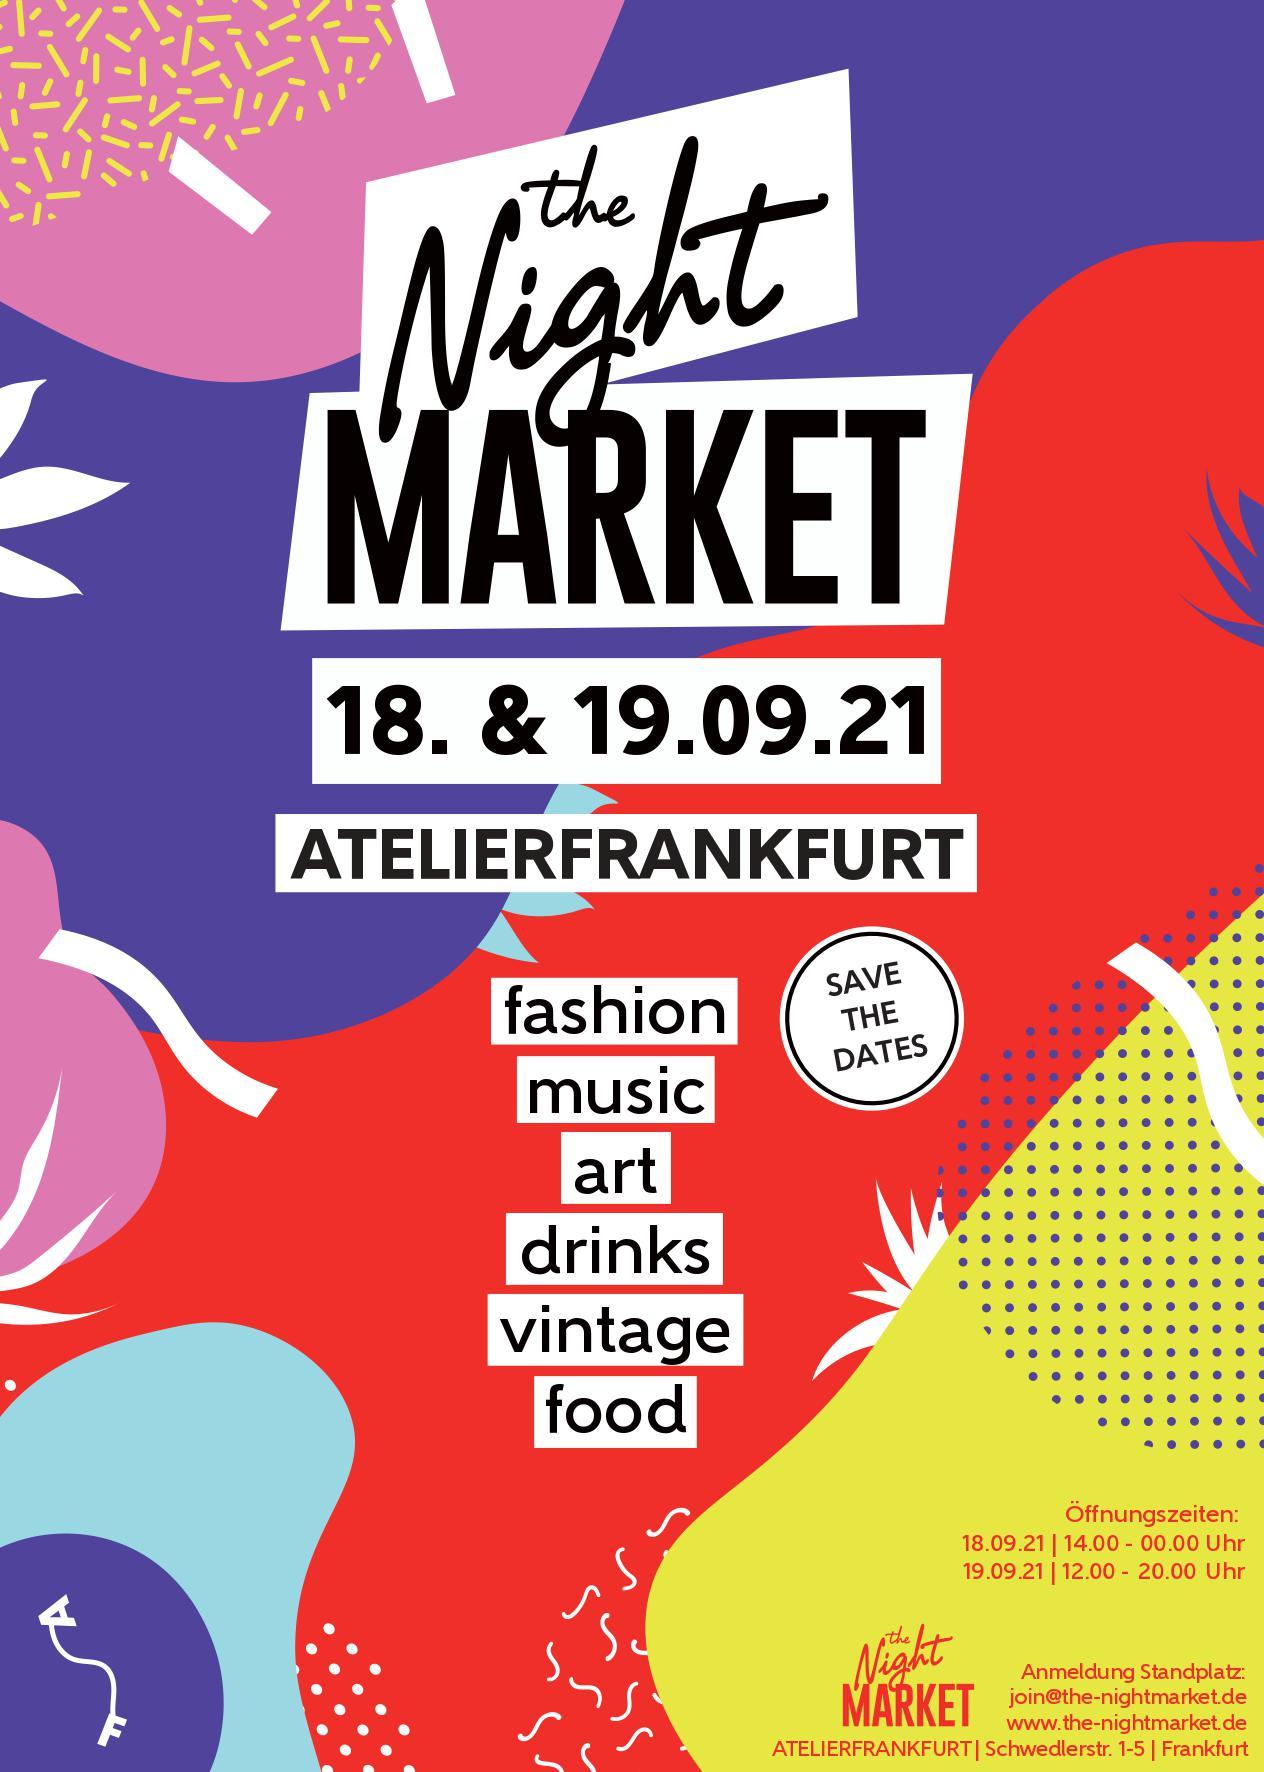 The Nightmarket Frankfurt September 2021